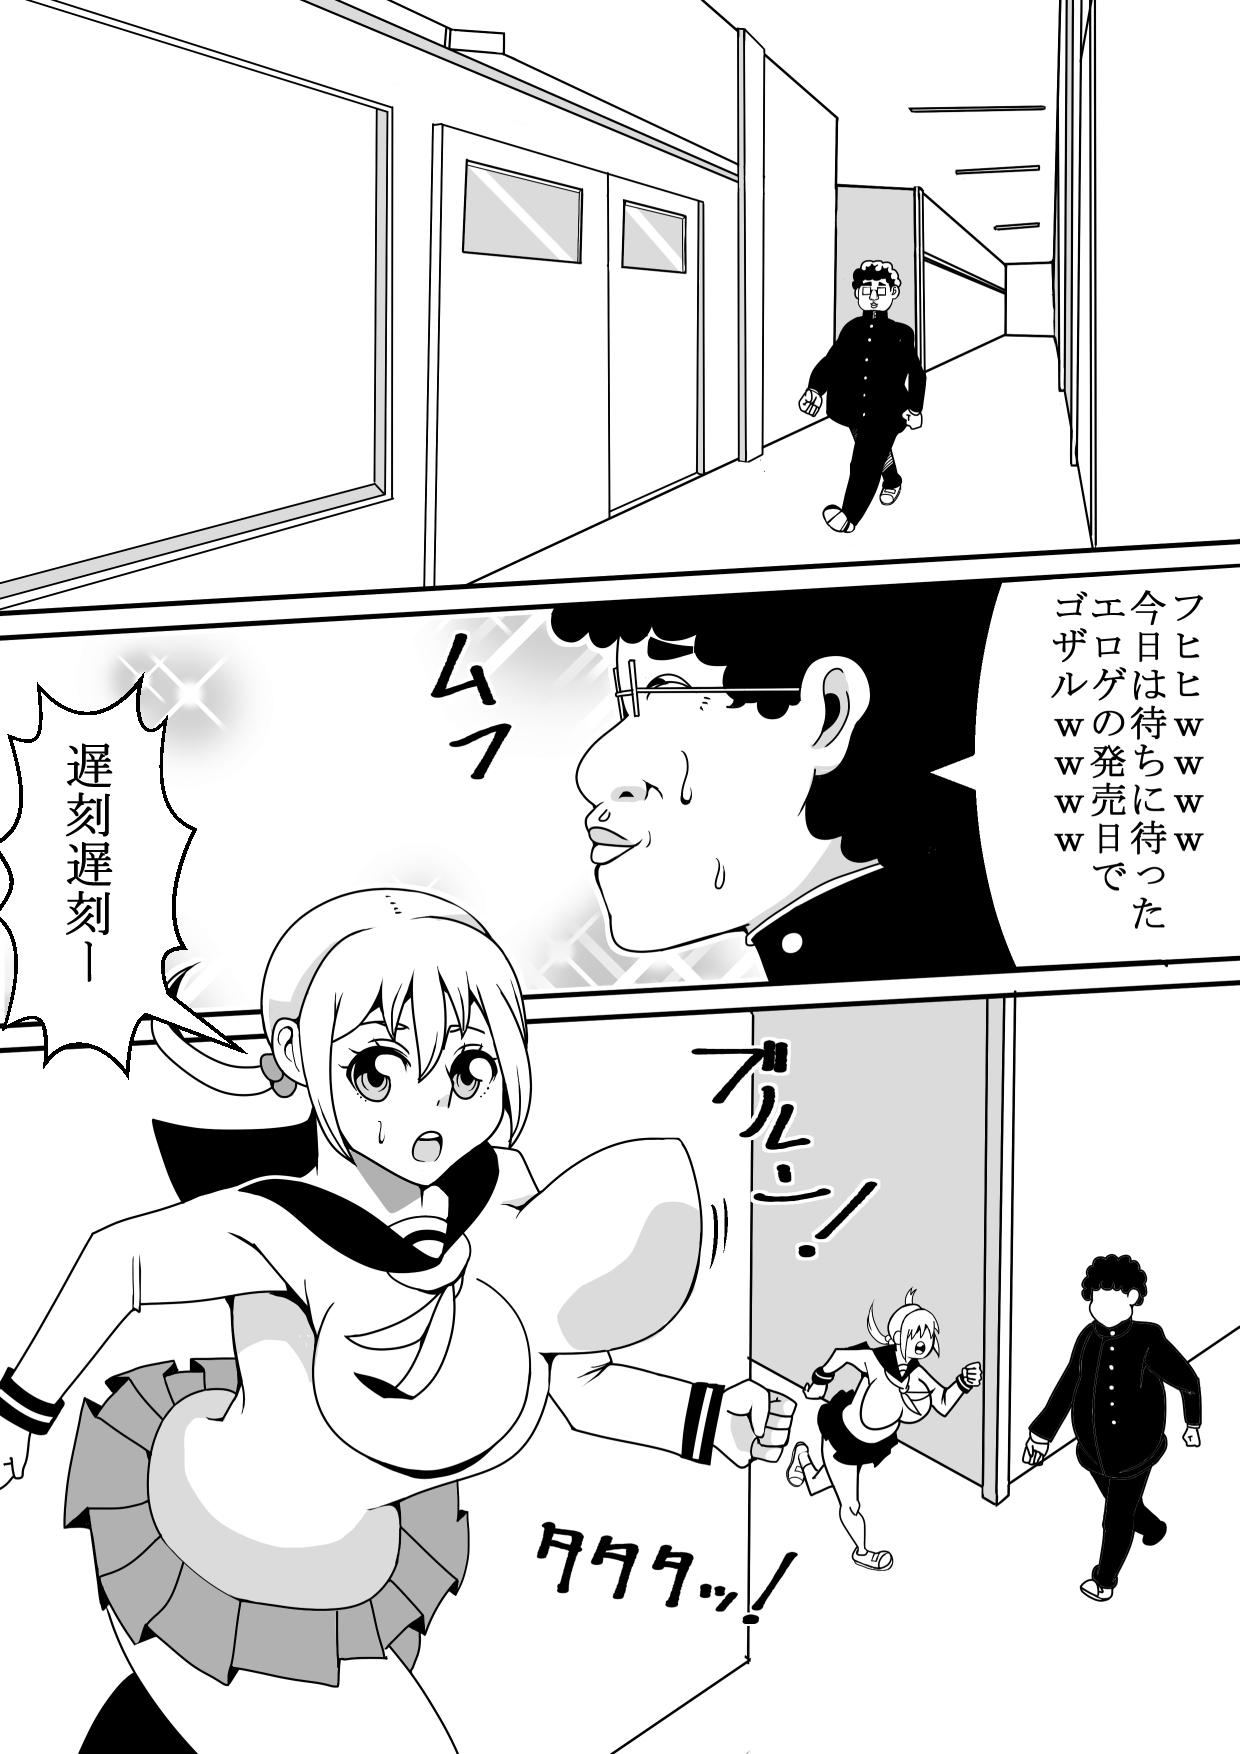 Kawaii JK to Kimoota ga Irekawari Sex 1